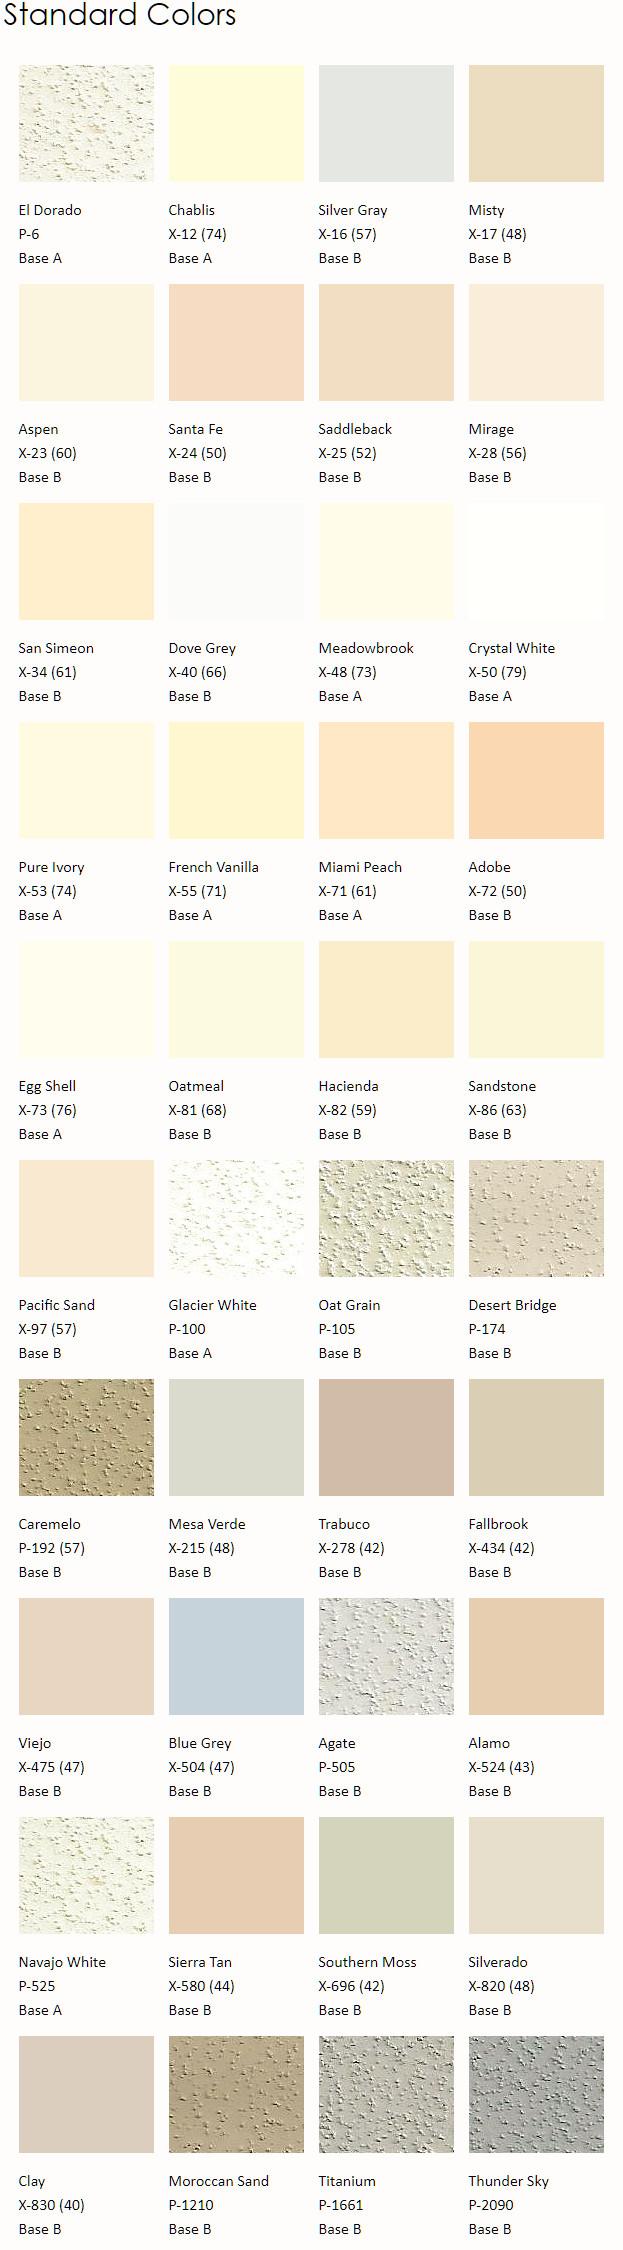 Merlex Standard Colors